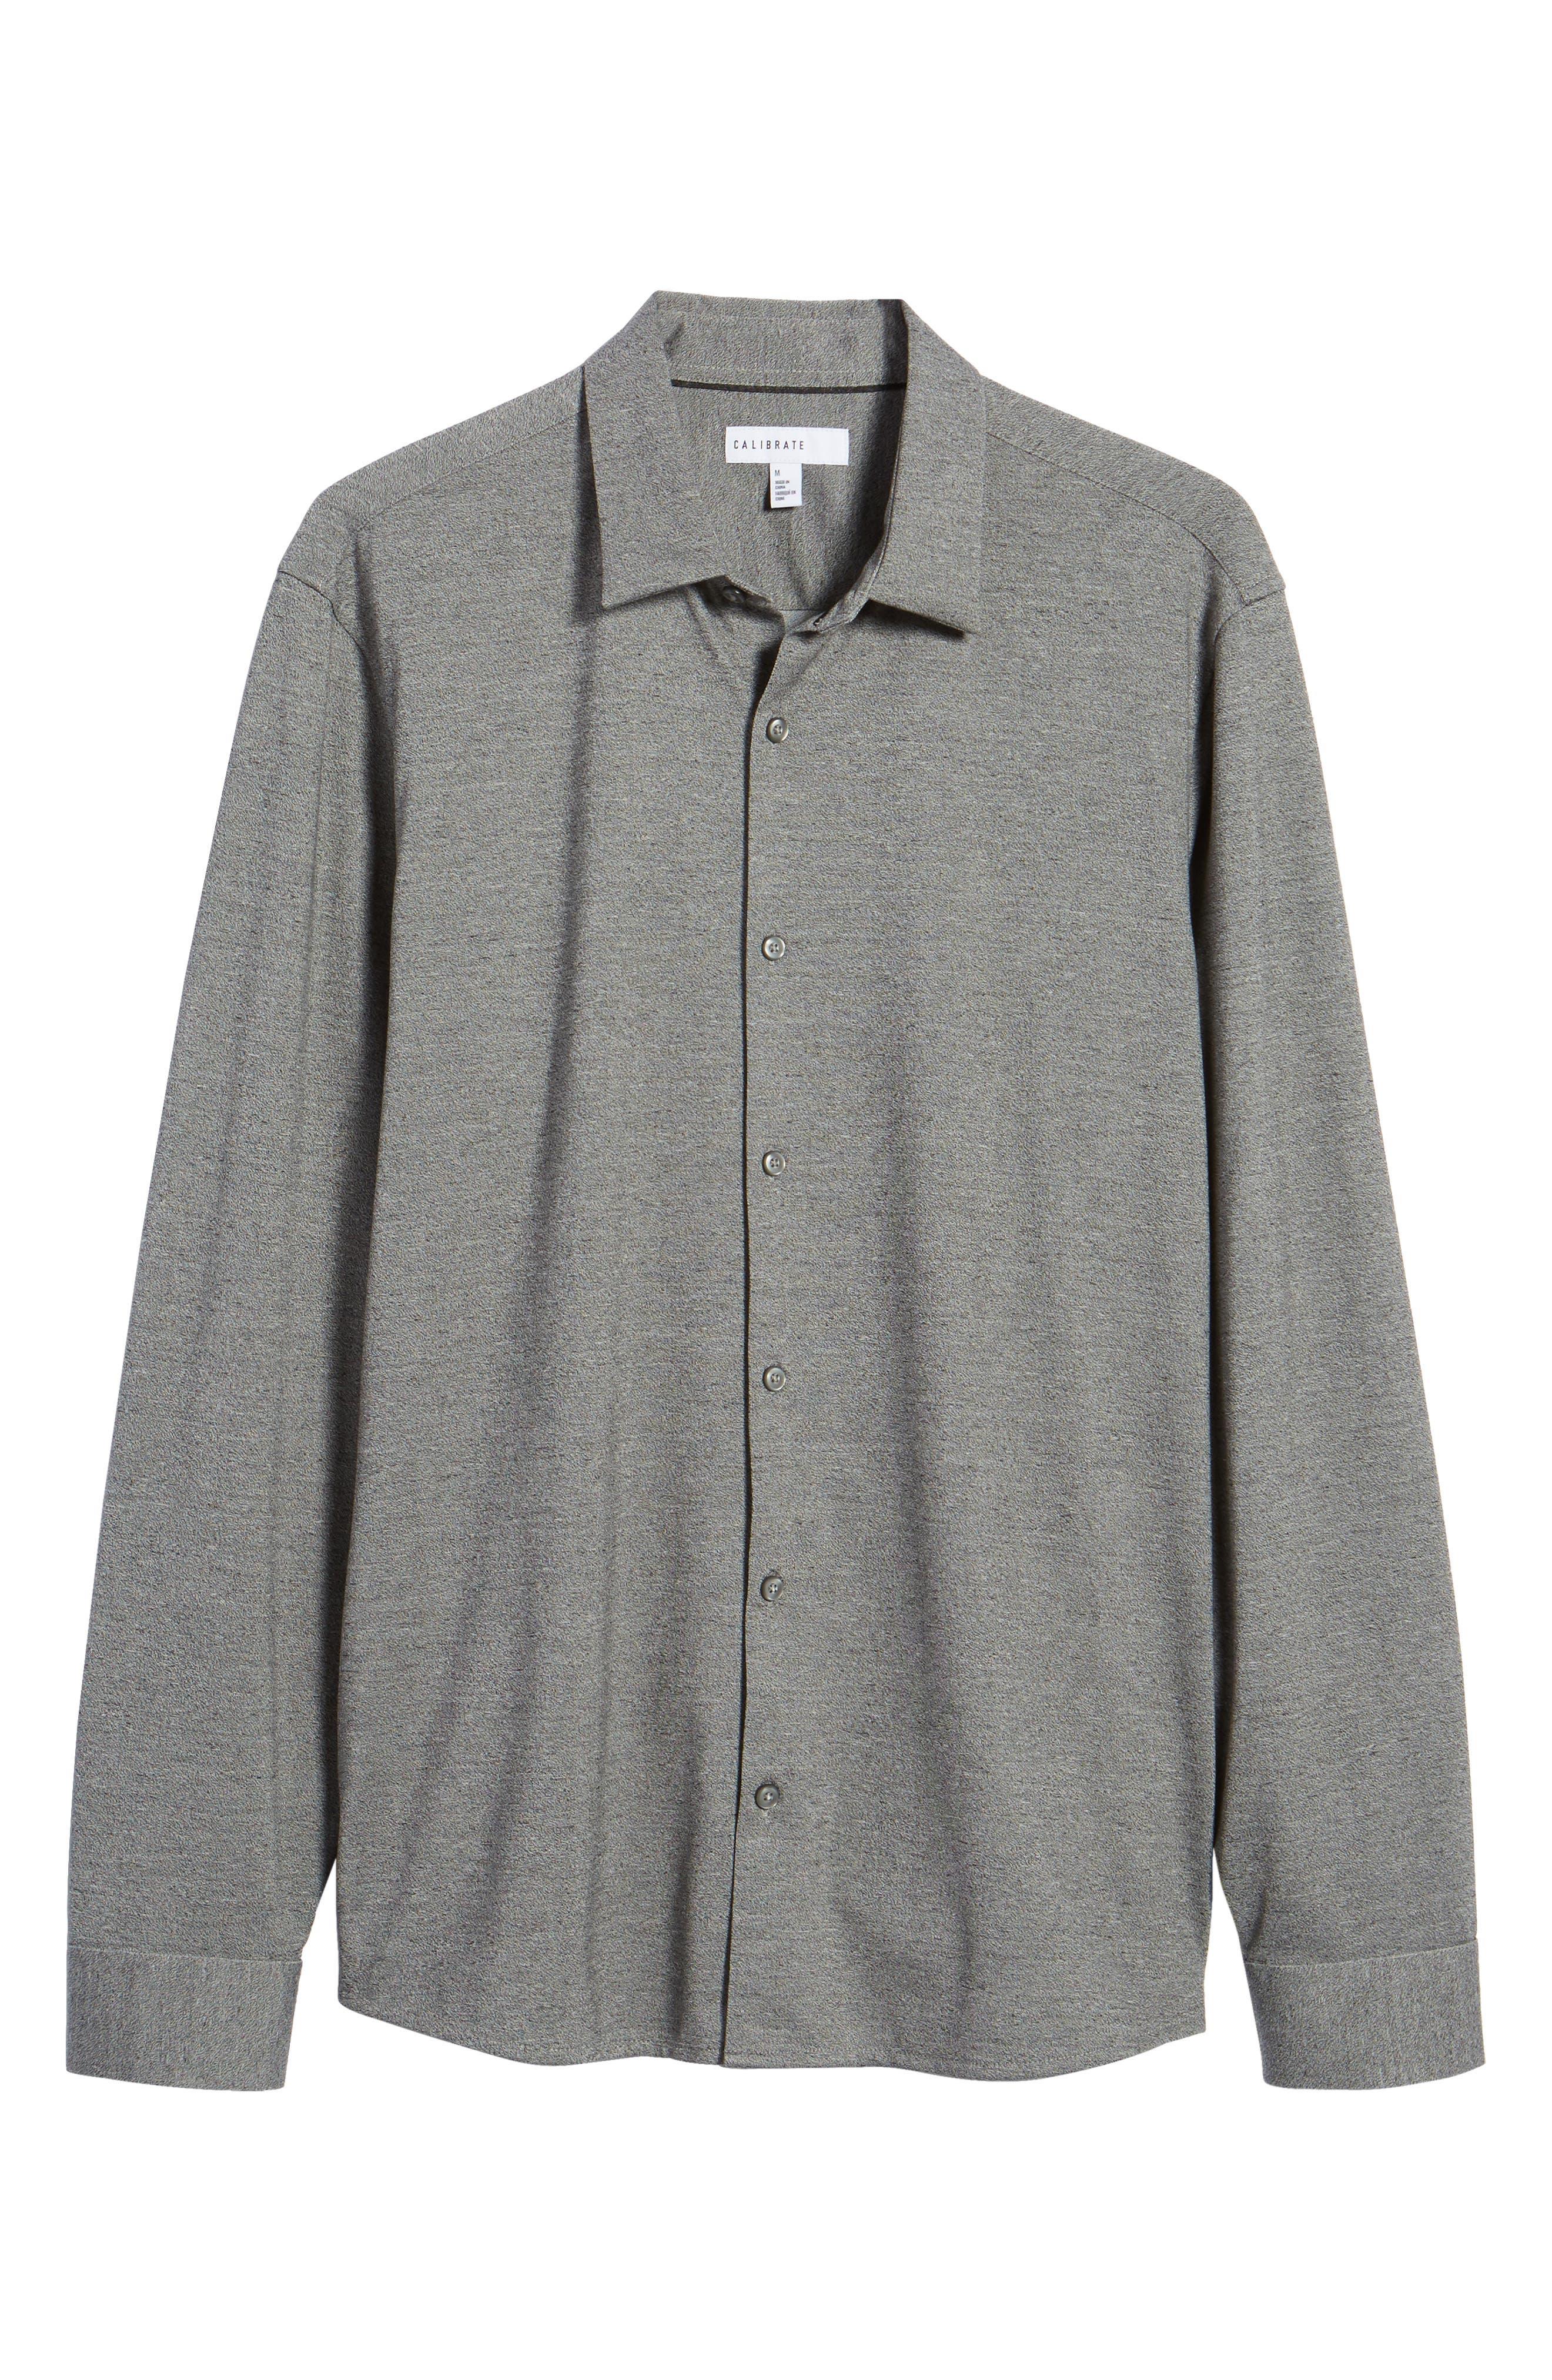 Knit Sport Shirt,                             Alternate thumbnail 12, color,